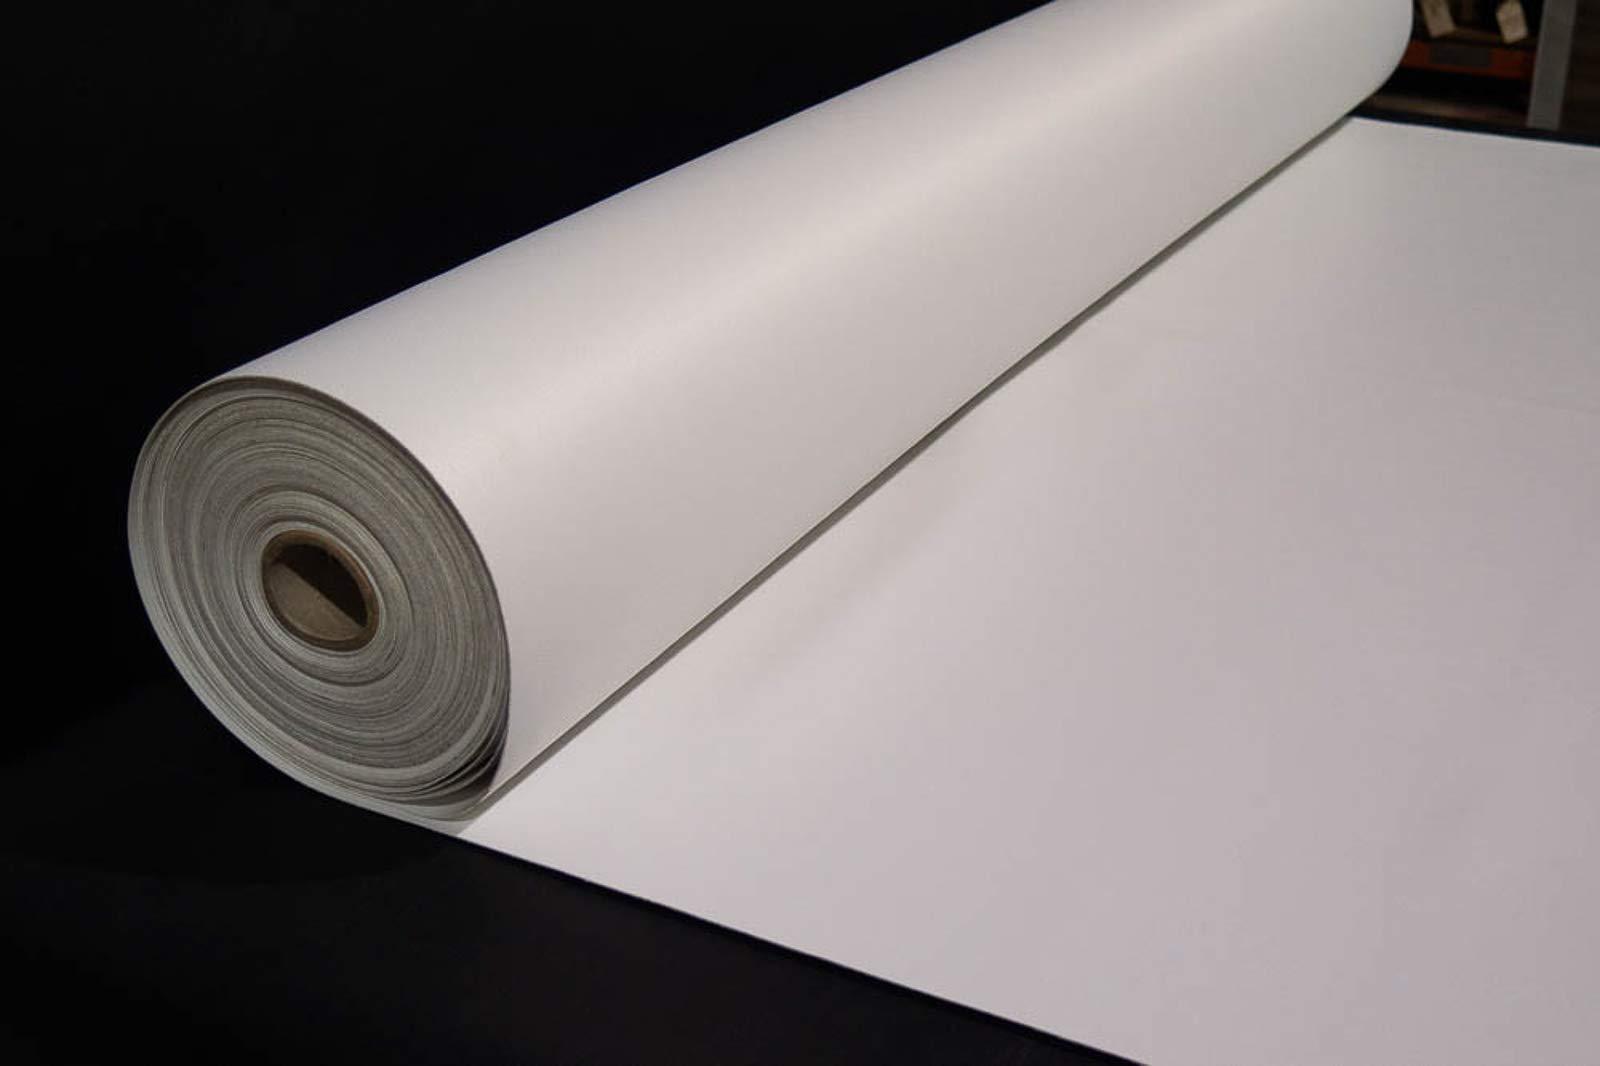 Bry-Tech Marine1 Marine Vinyl Upholstery Fabric Bright White 54'' Wide by 10 Yards Boat Auto by Bry-Tech Marine1 (Image #5)